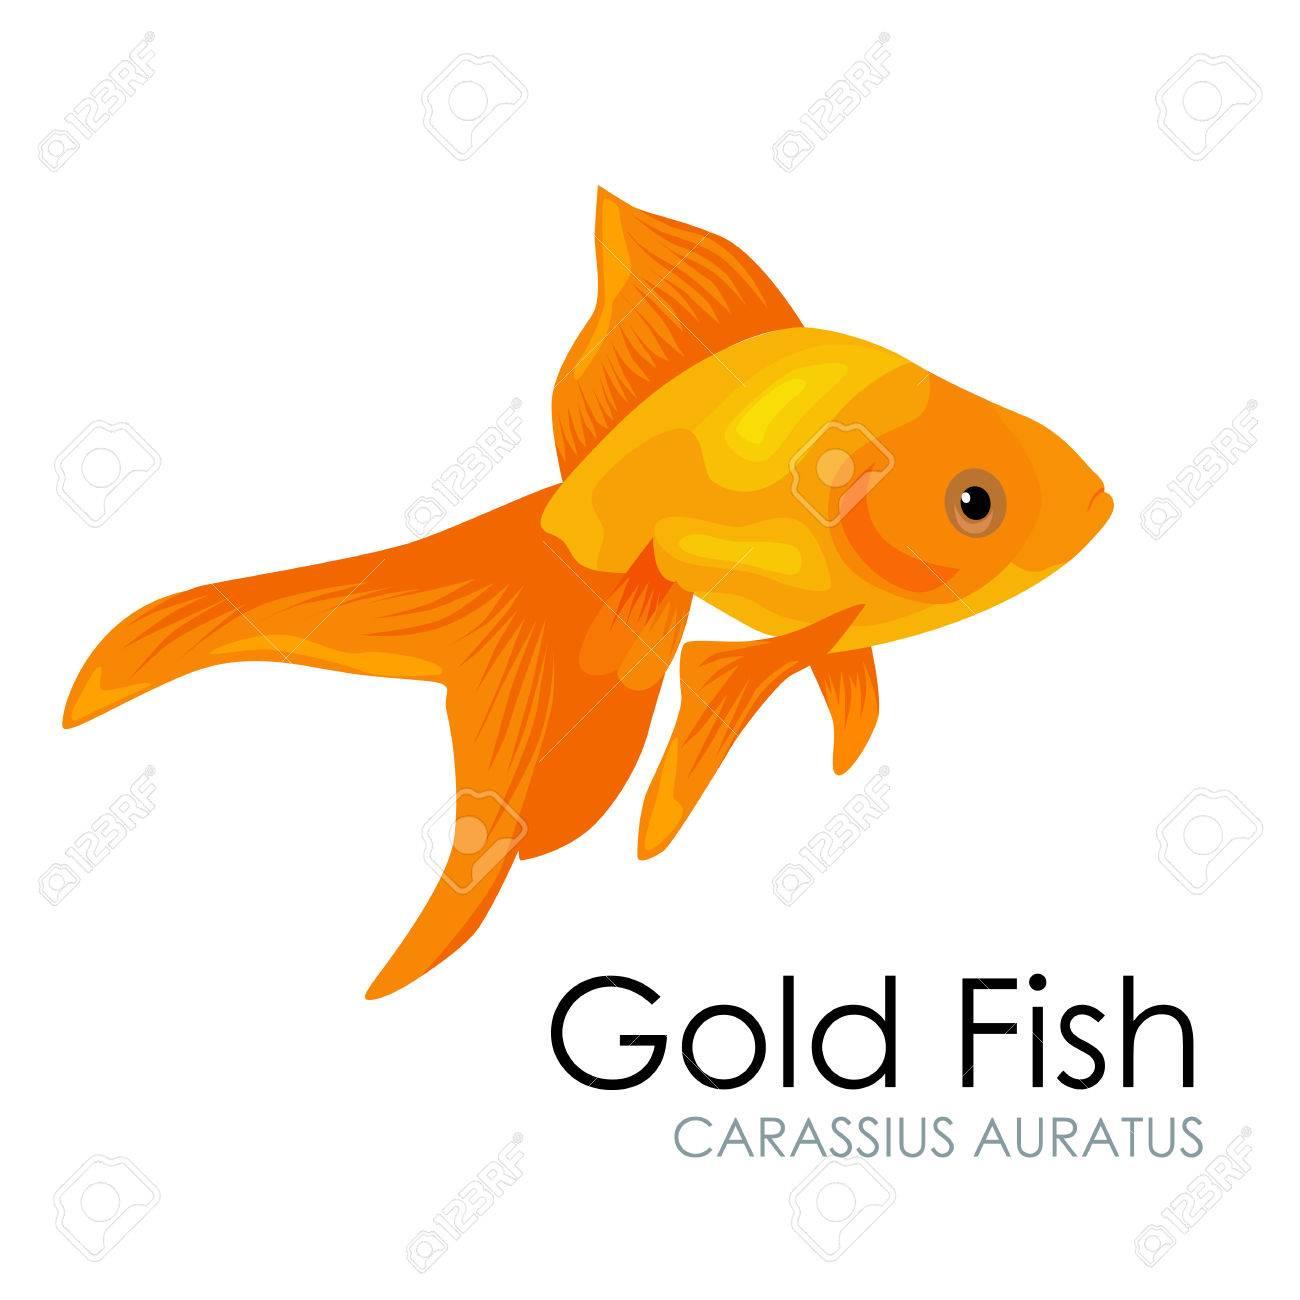 Cute Aquarium Gold Fish Vector Illustration Isolated On White